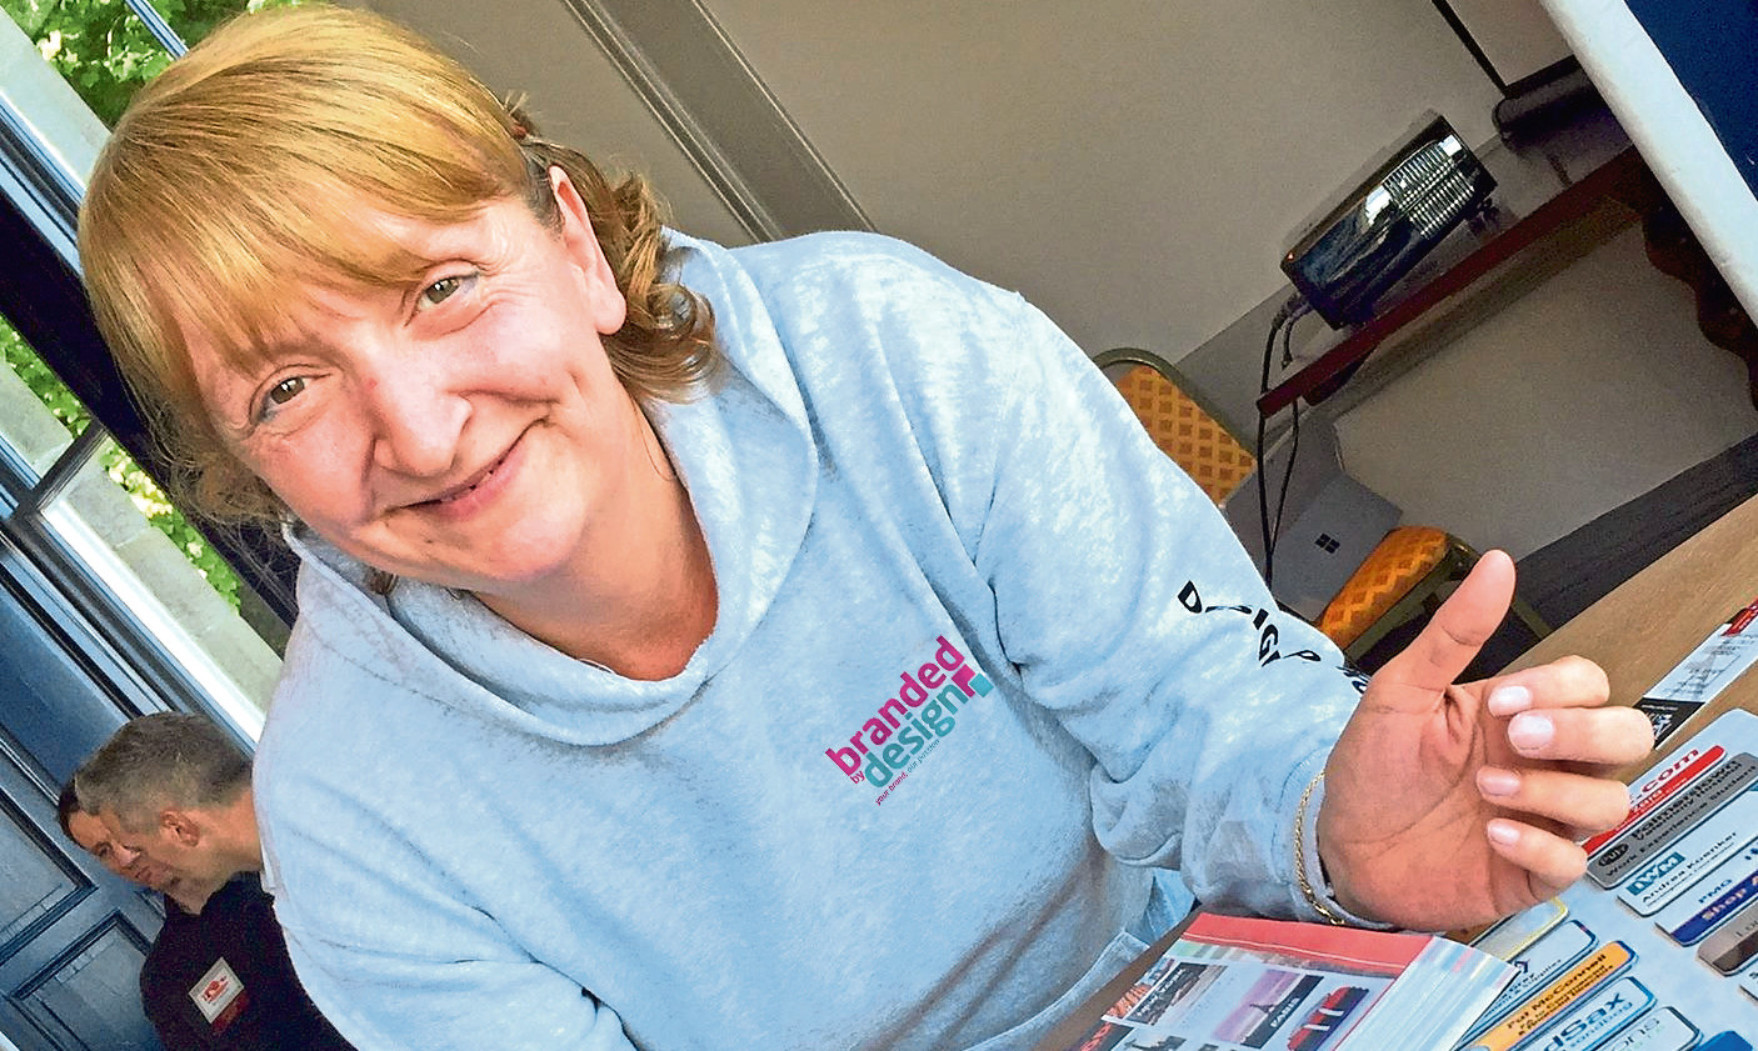 Amanda Little of Branded by Design of Dunfermline